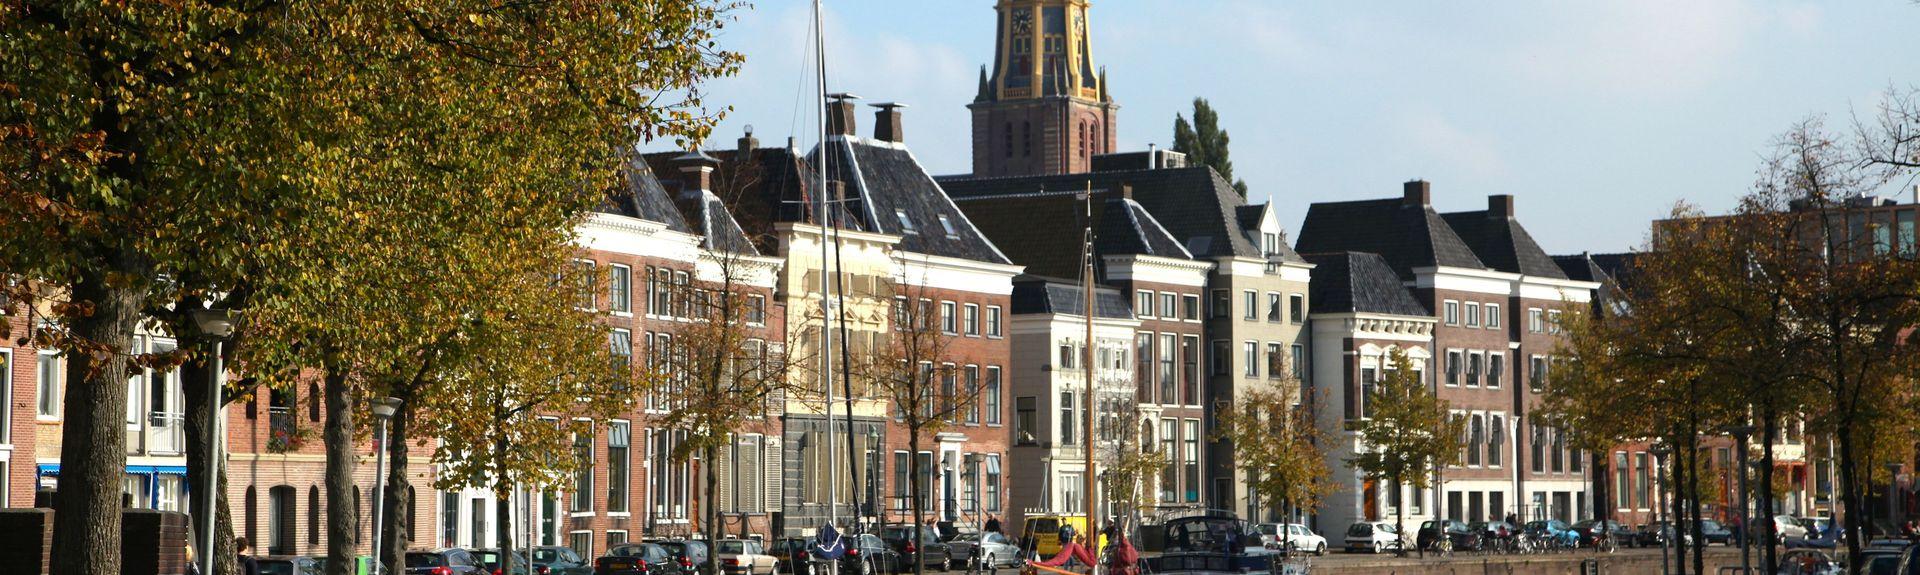 Groningen, Holanda